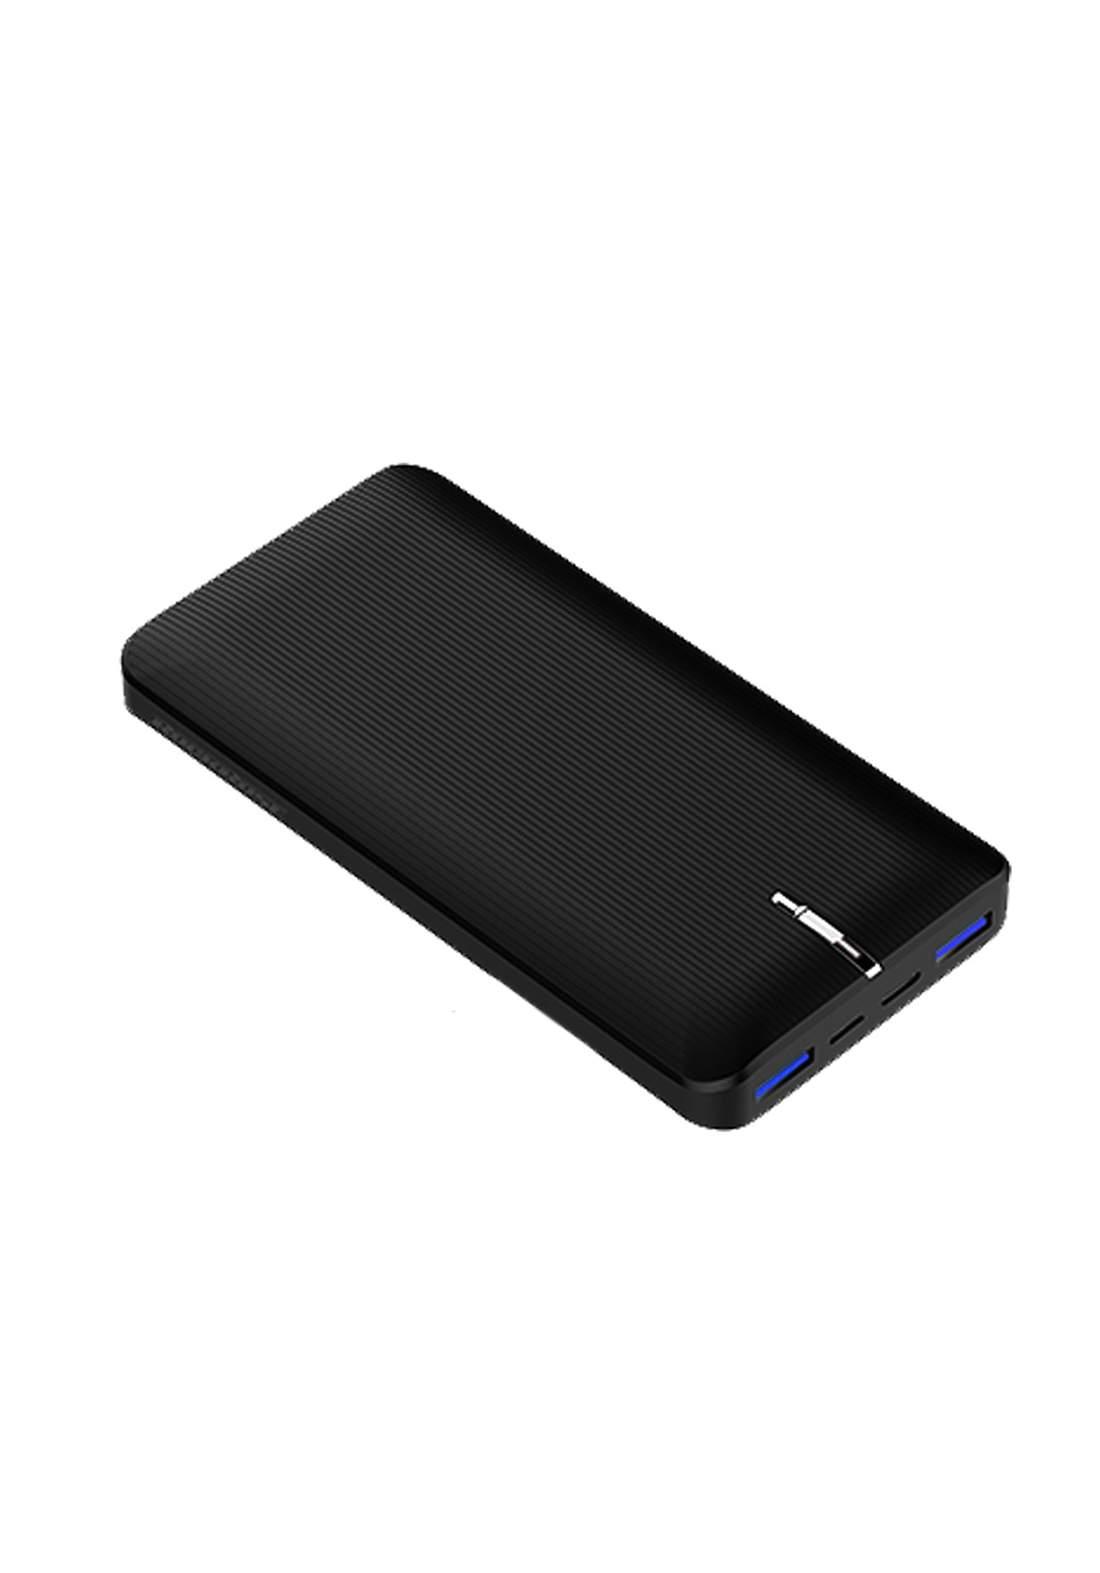 (4044)Rockrose RRPB14B Power Bank Vogue 20 Pro Three Ports 20000mAh PD & QC 3.0 - Black